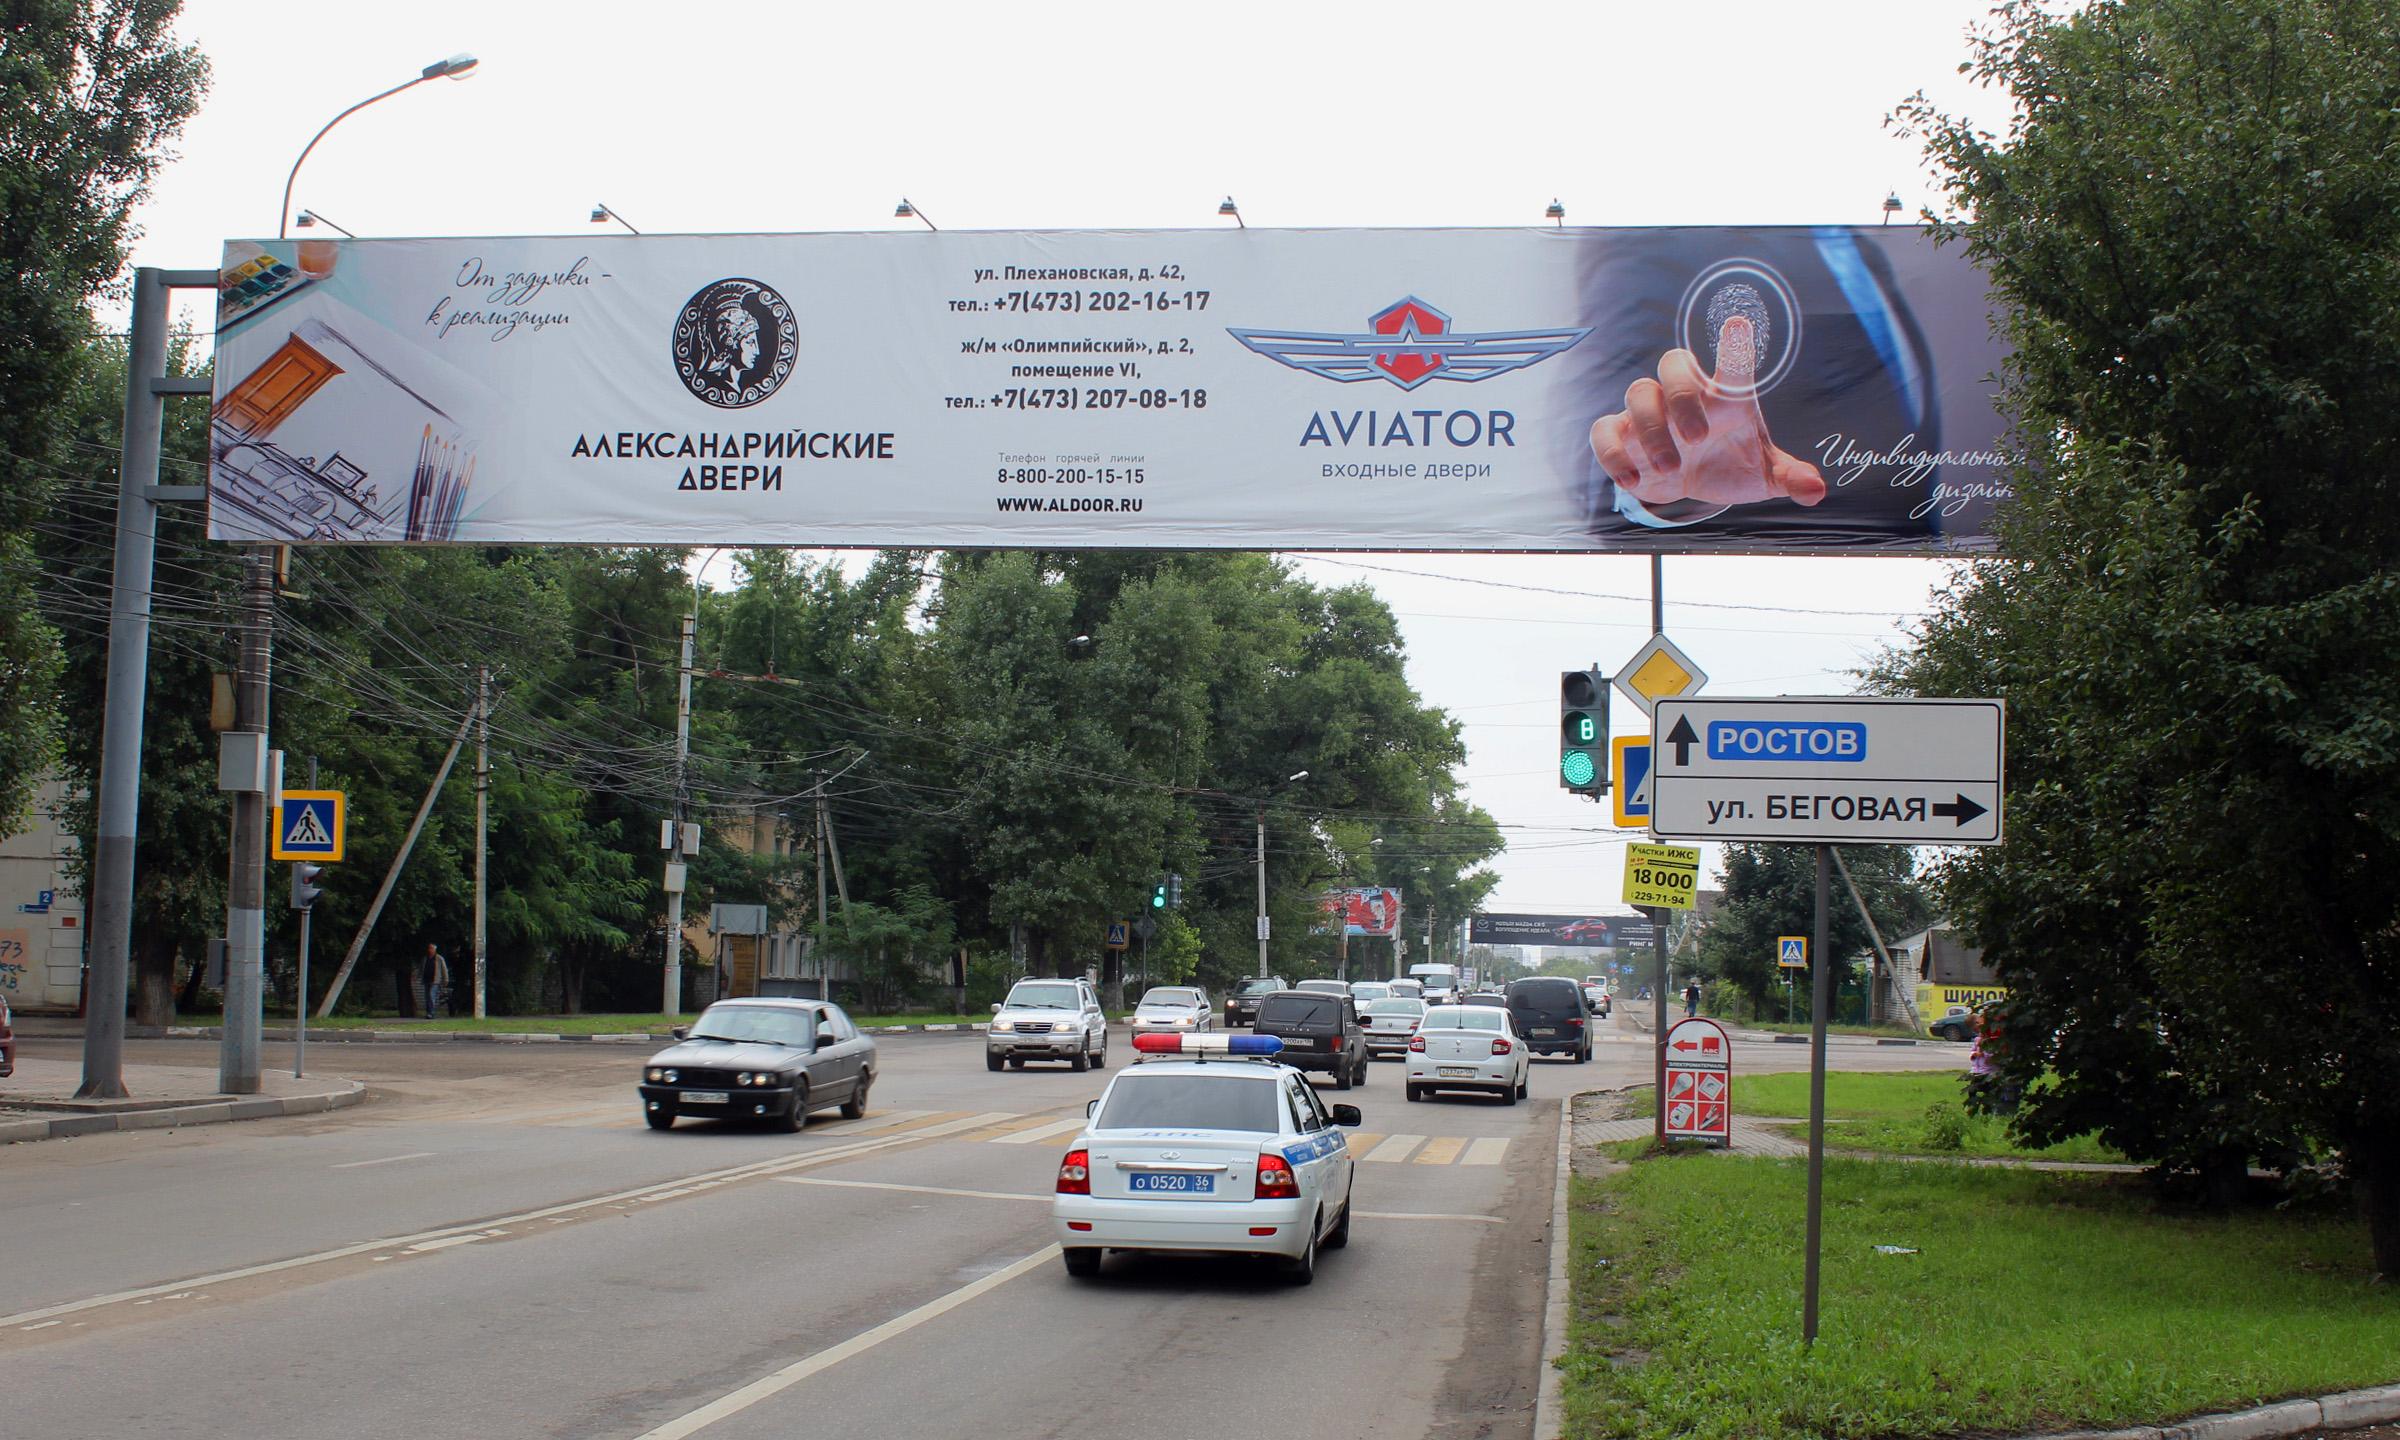 231А А2А3 ул Шишкова - ул Беговая порал в центр (2)